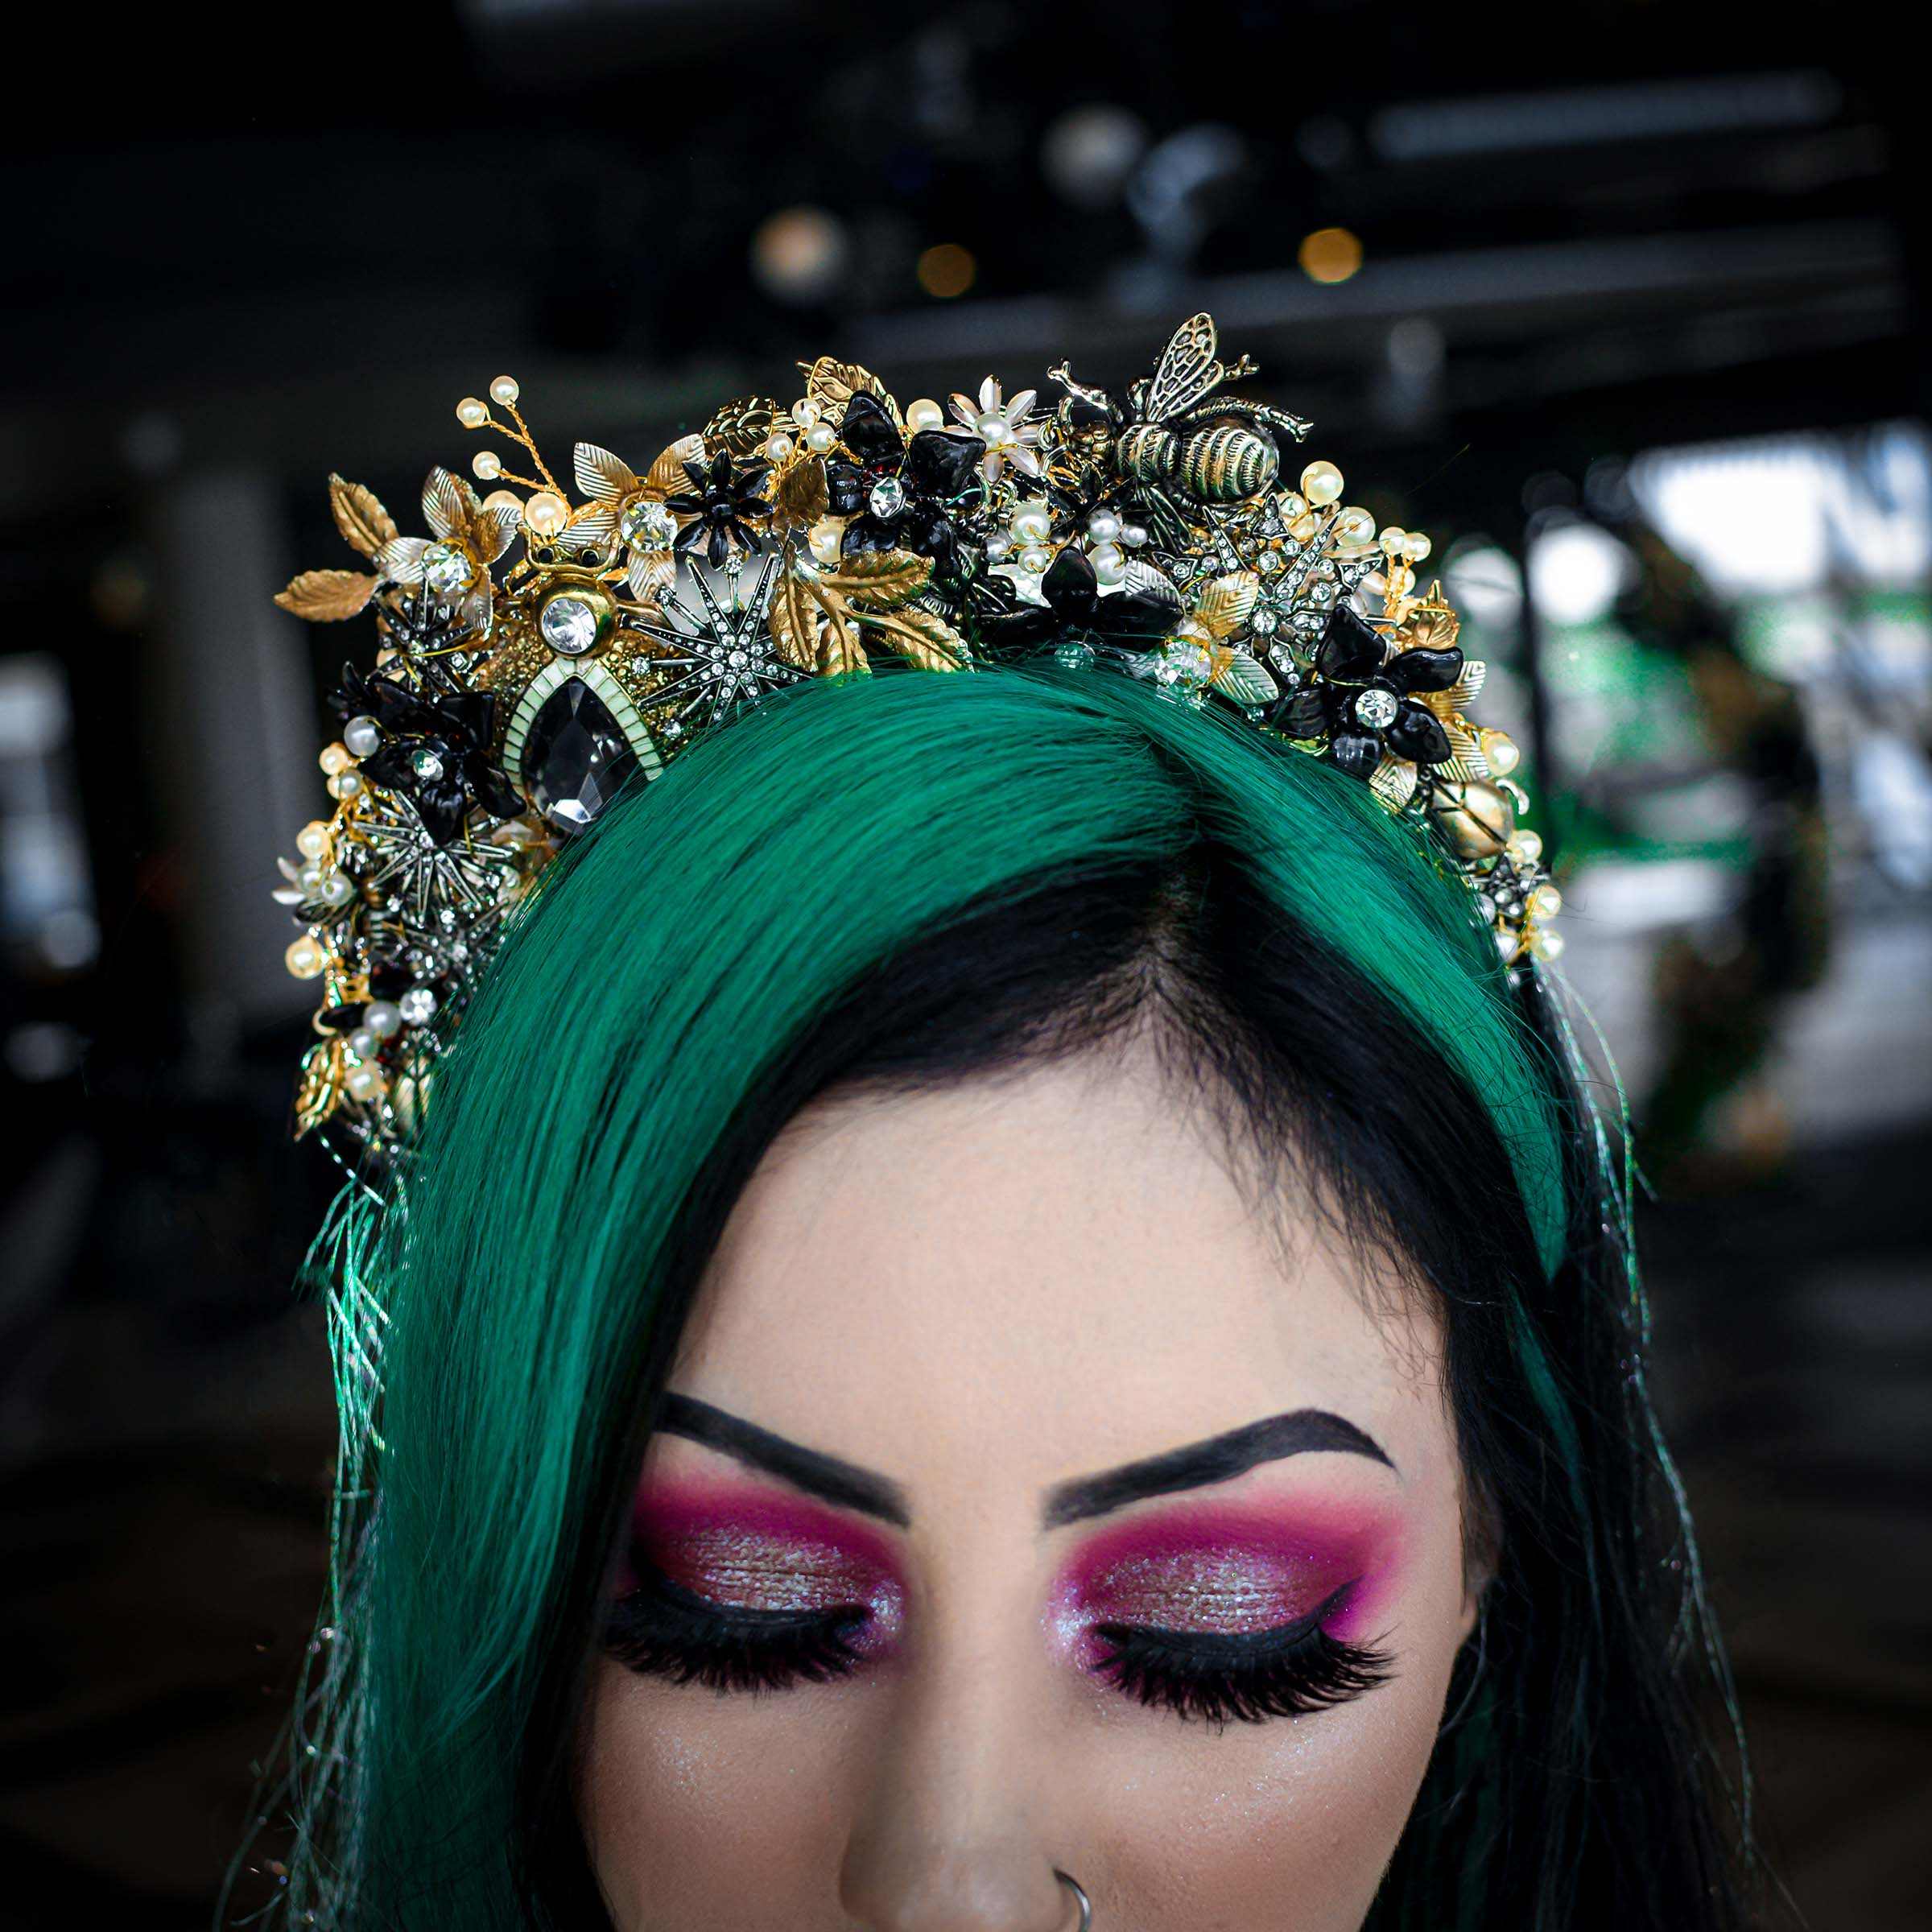 alternative luxe wedding - slytherin wedding - gothic wedding - alternative wedding -bridal headpiece - bespoke bridal accessories